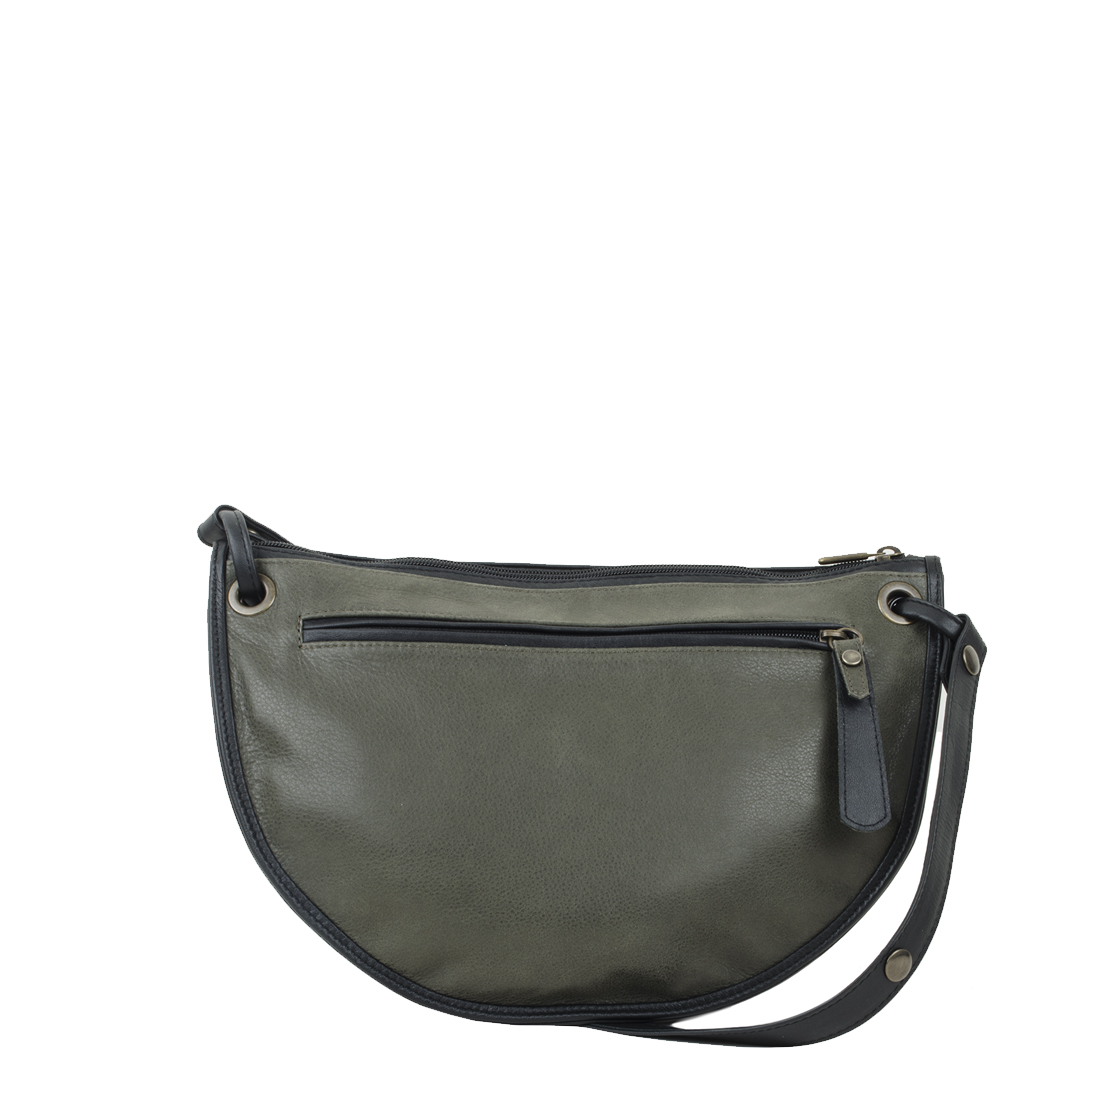 Rachel Olive Leather Across Body Bag